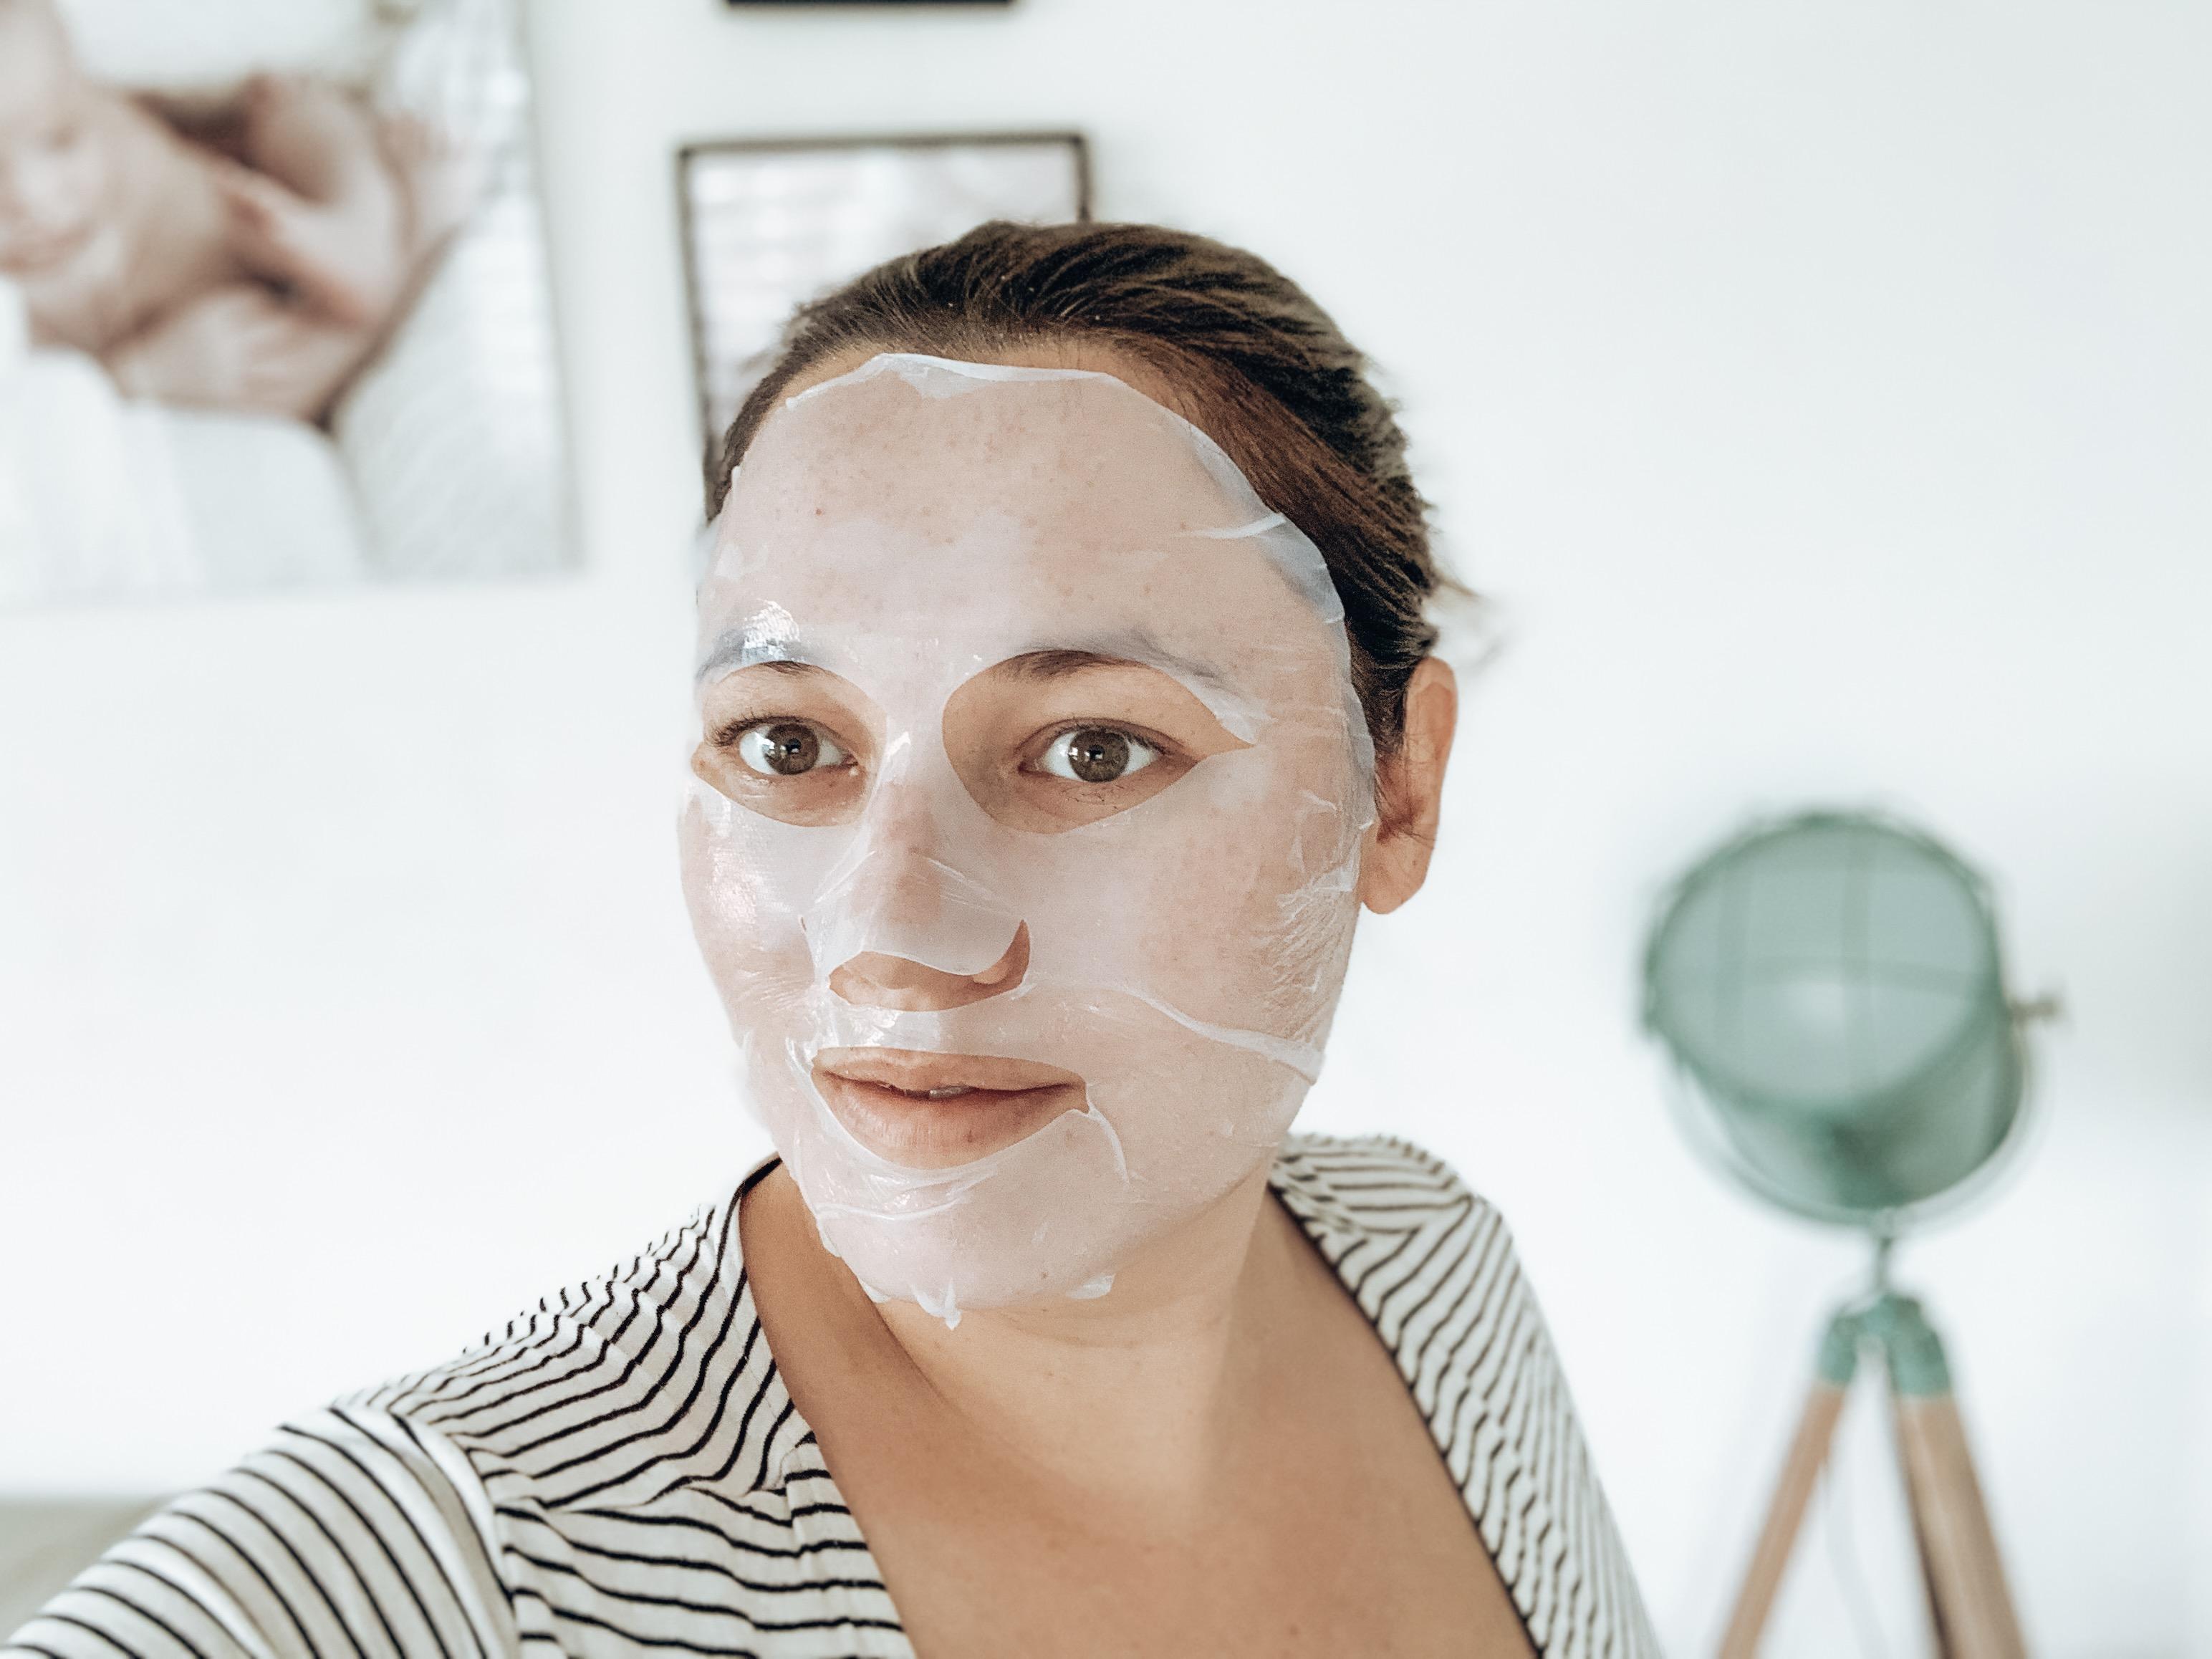 Fanllory Nourishing & Hydrating Face Mask aangebracht op gezicht